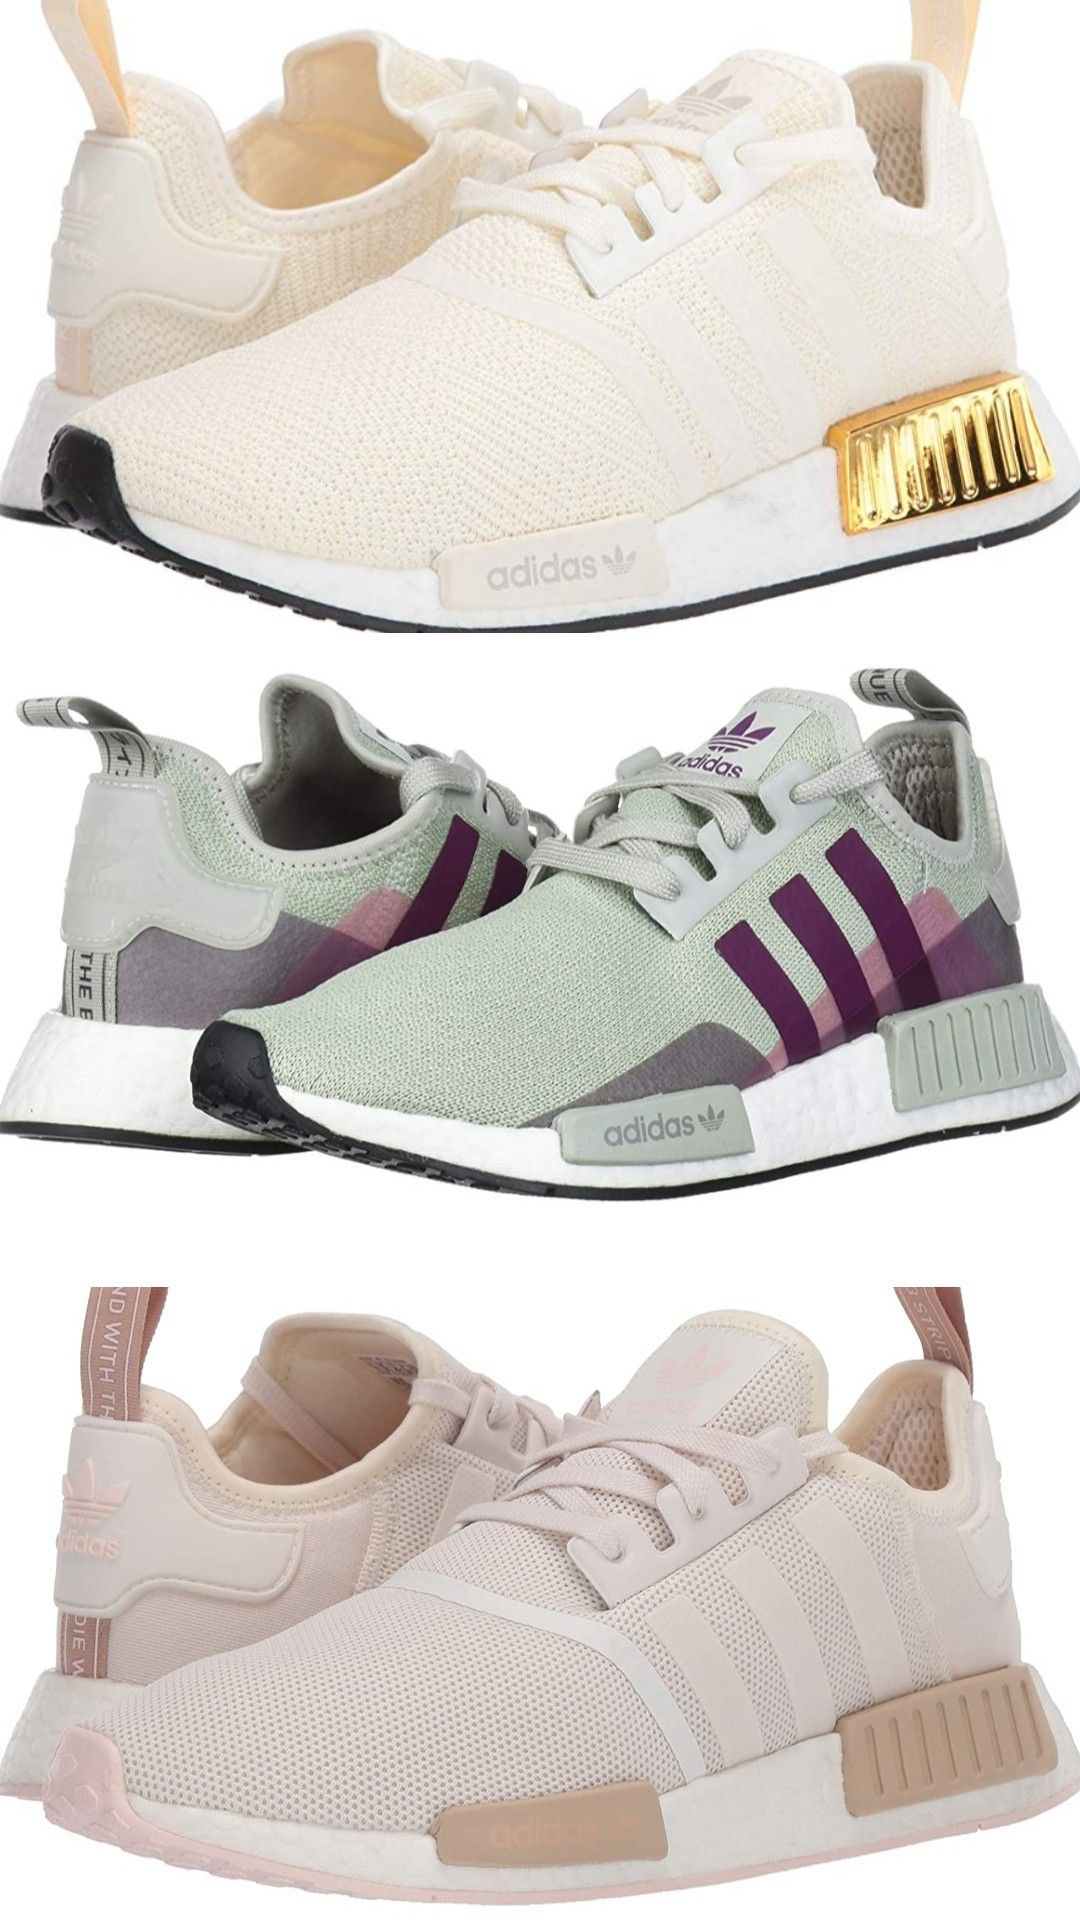 adidas Originals Womens NMD_r1 Sneaker